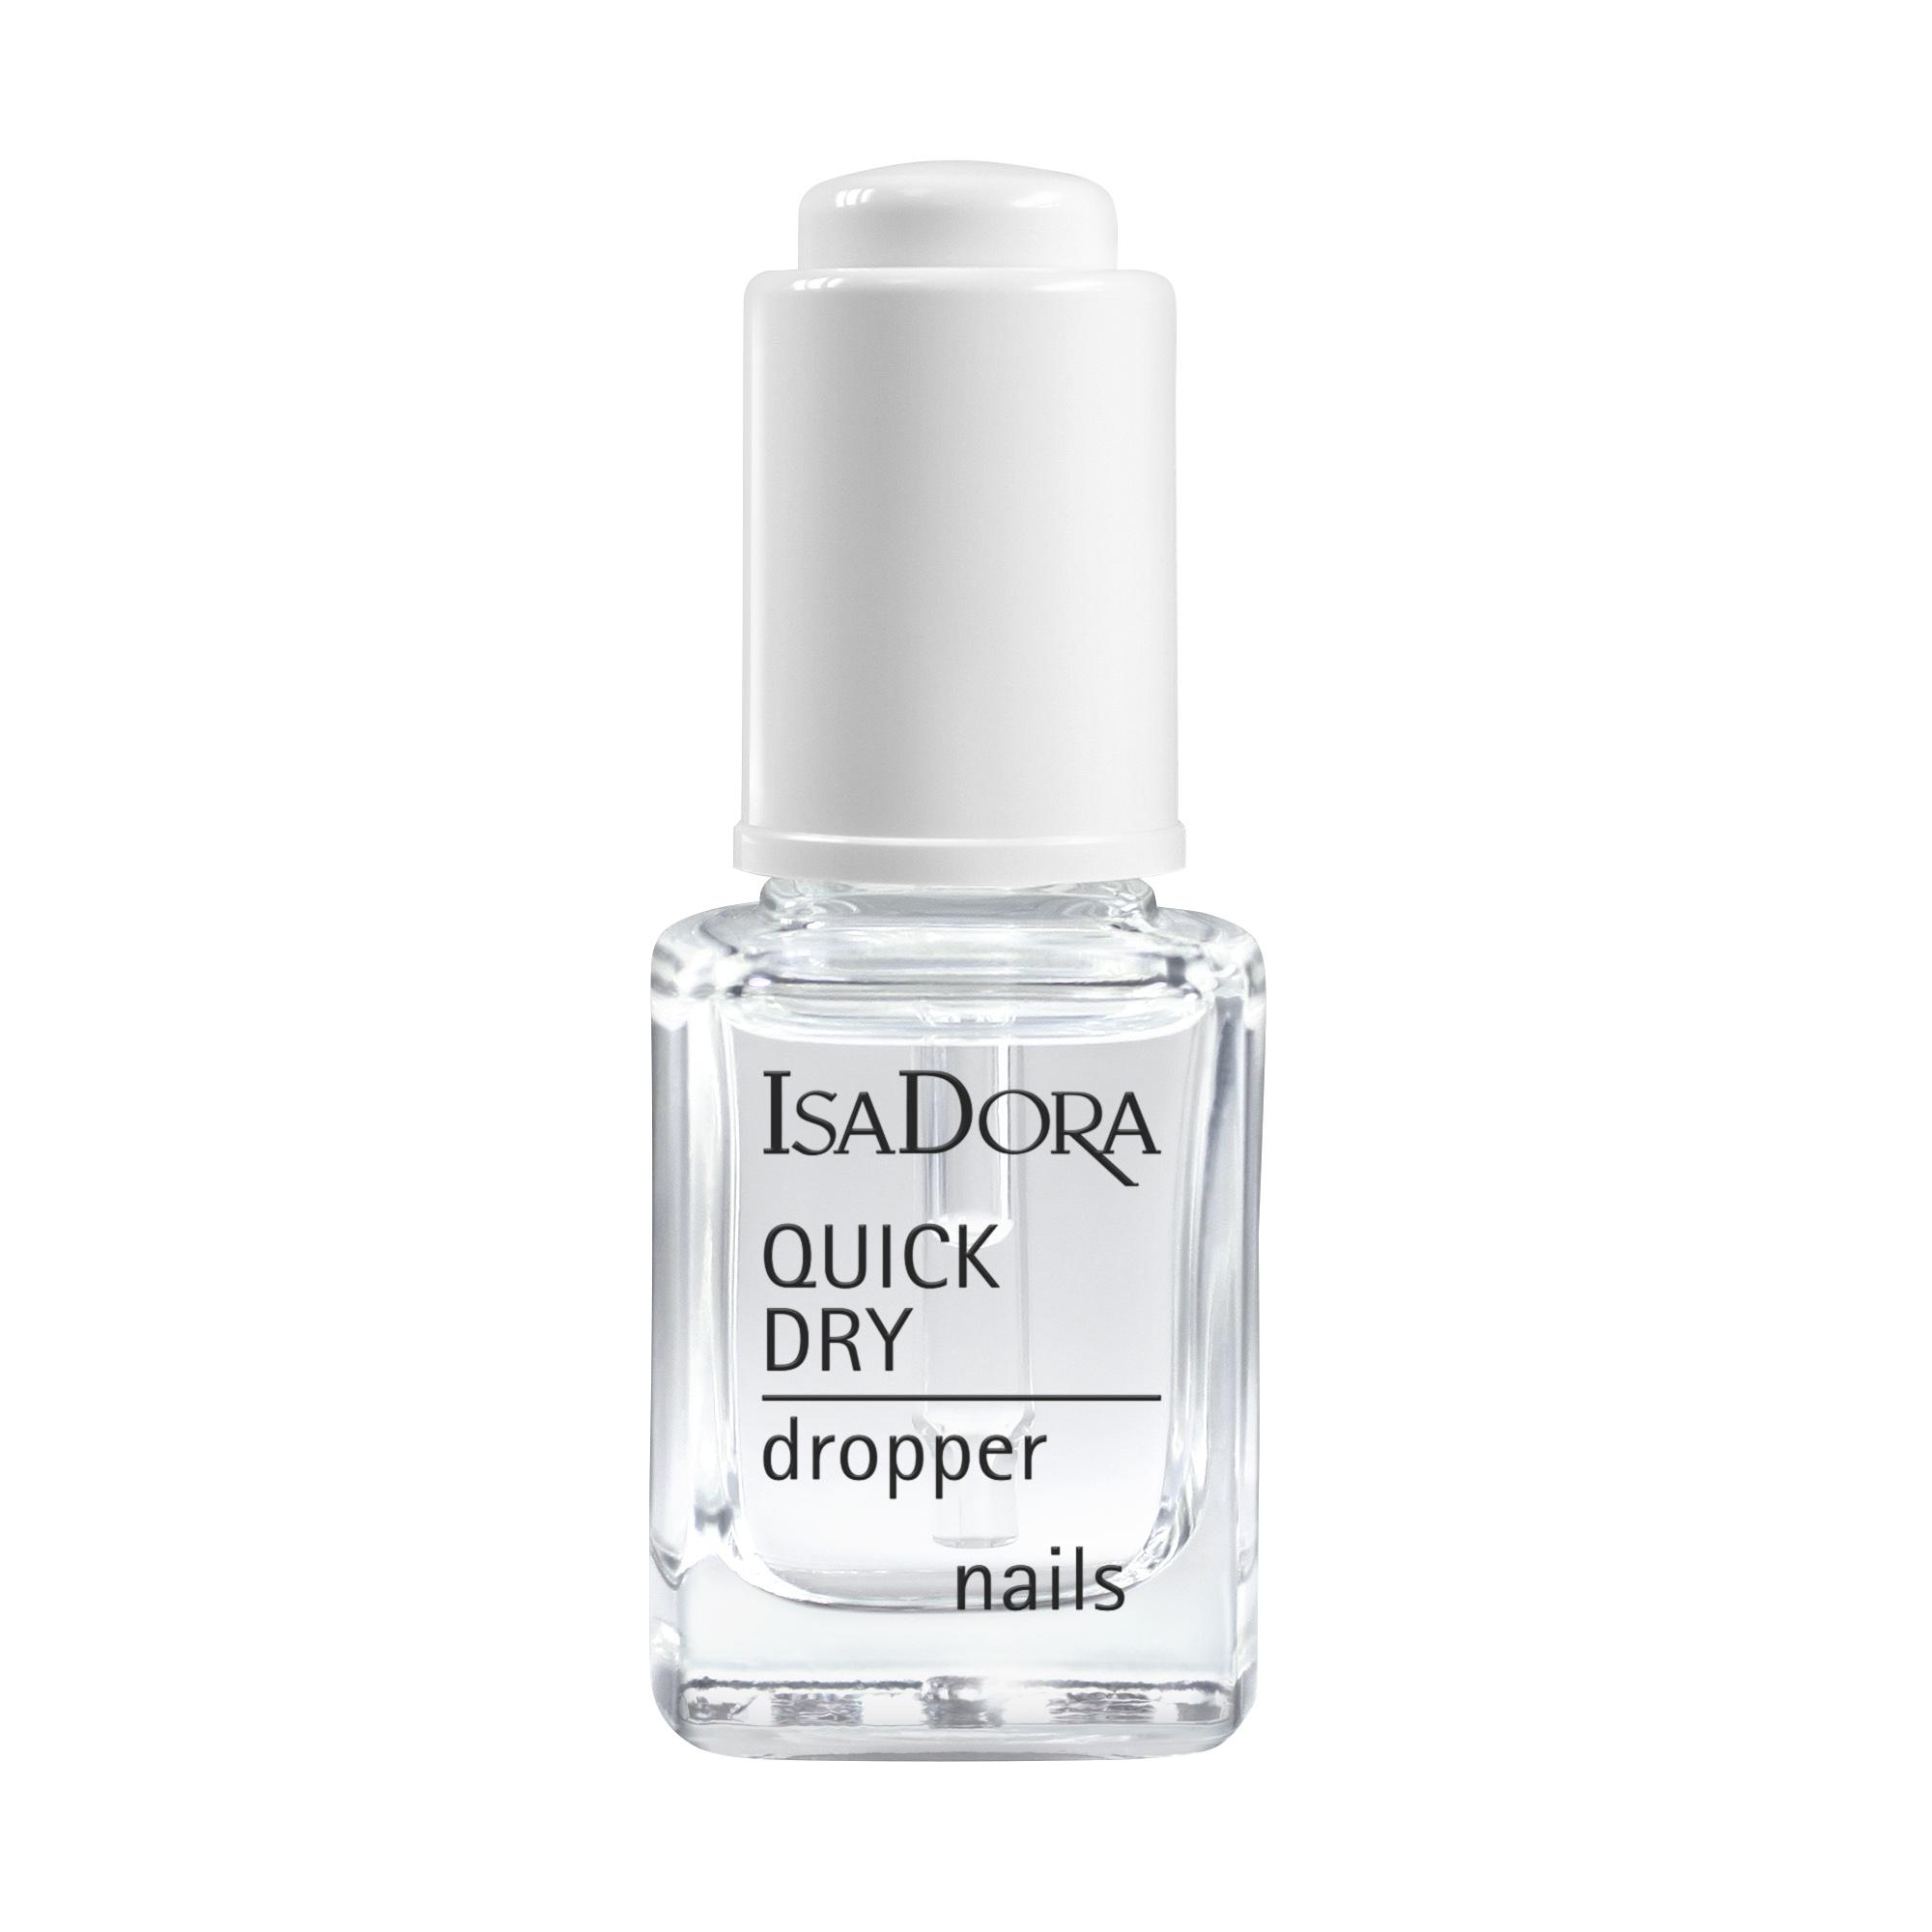 Quick Dry Dropper